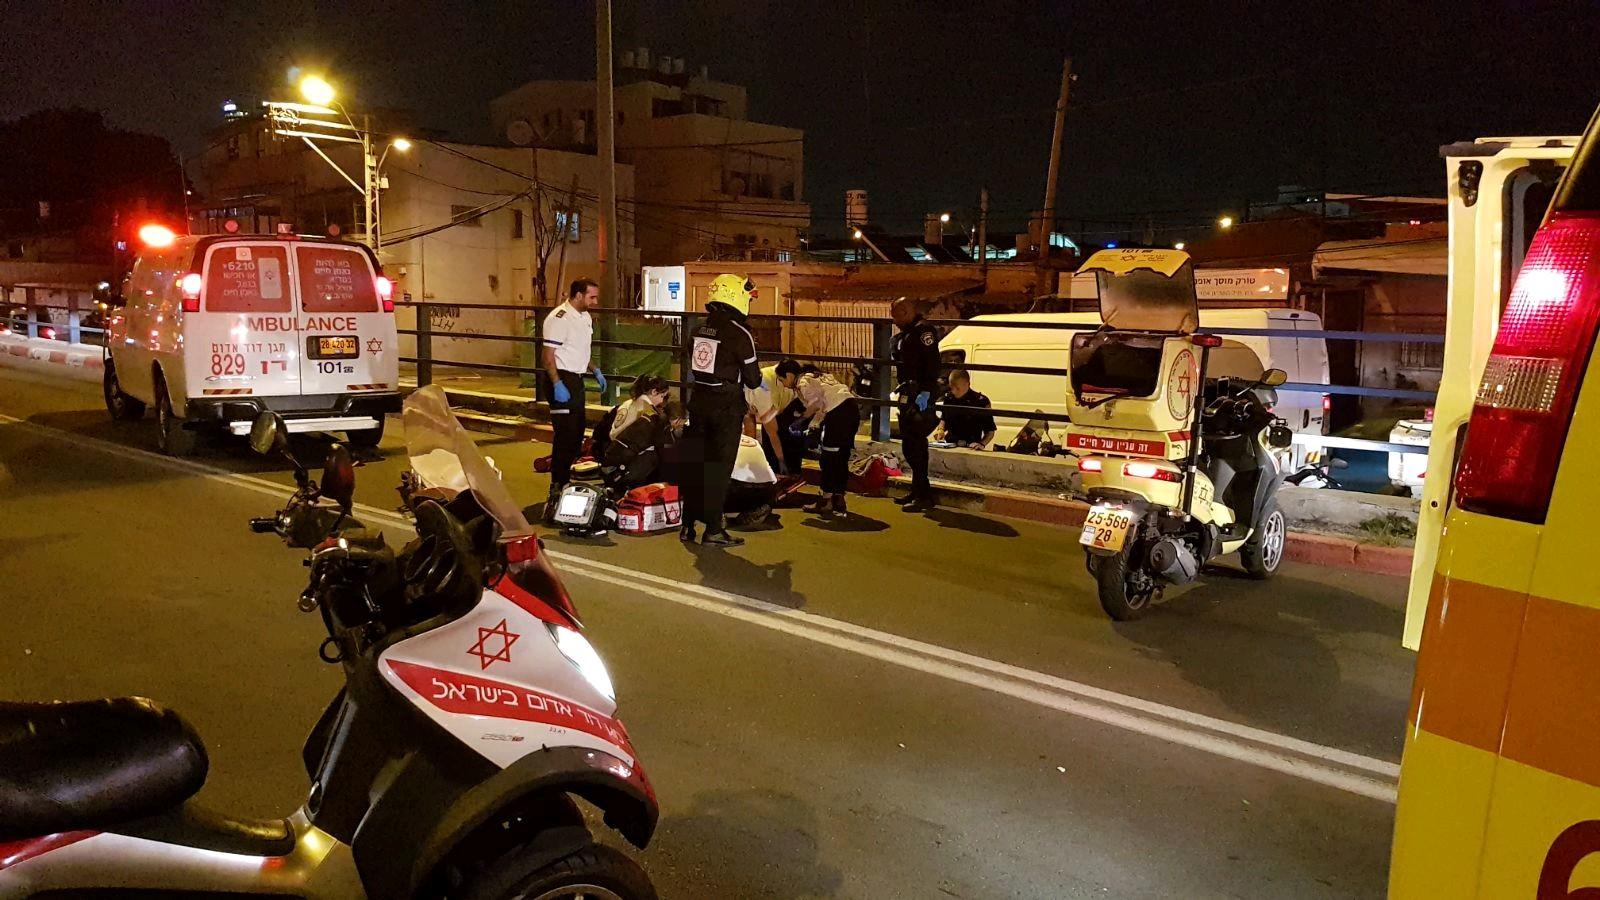 Photo of גבר כבן 40 נפגע באורח אנוש מפגיעת אוטובוס בדרל חיל השריו בתל אביב